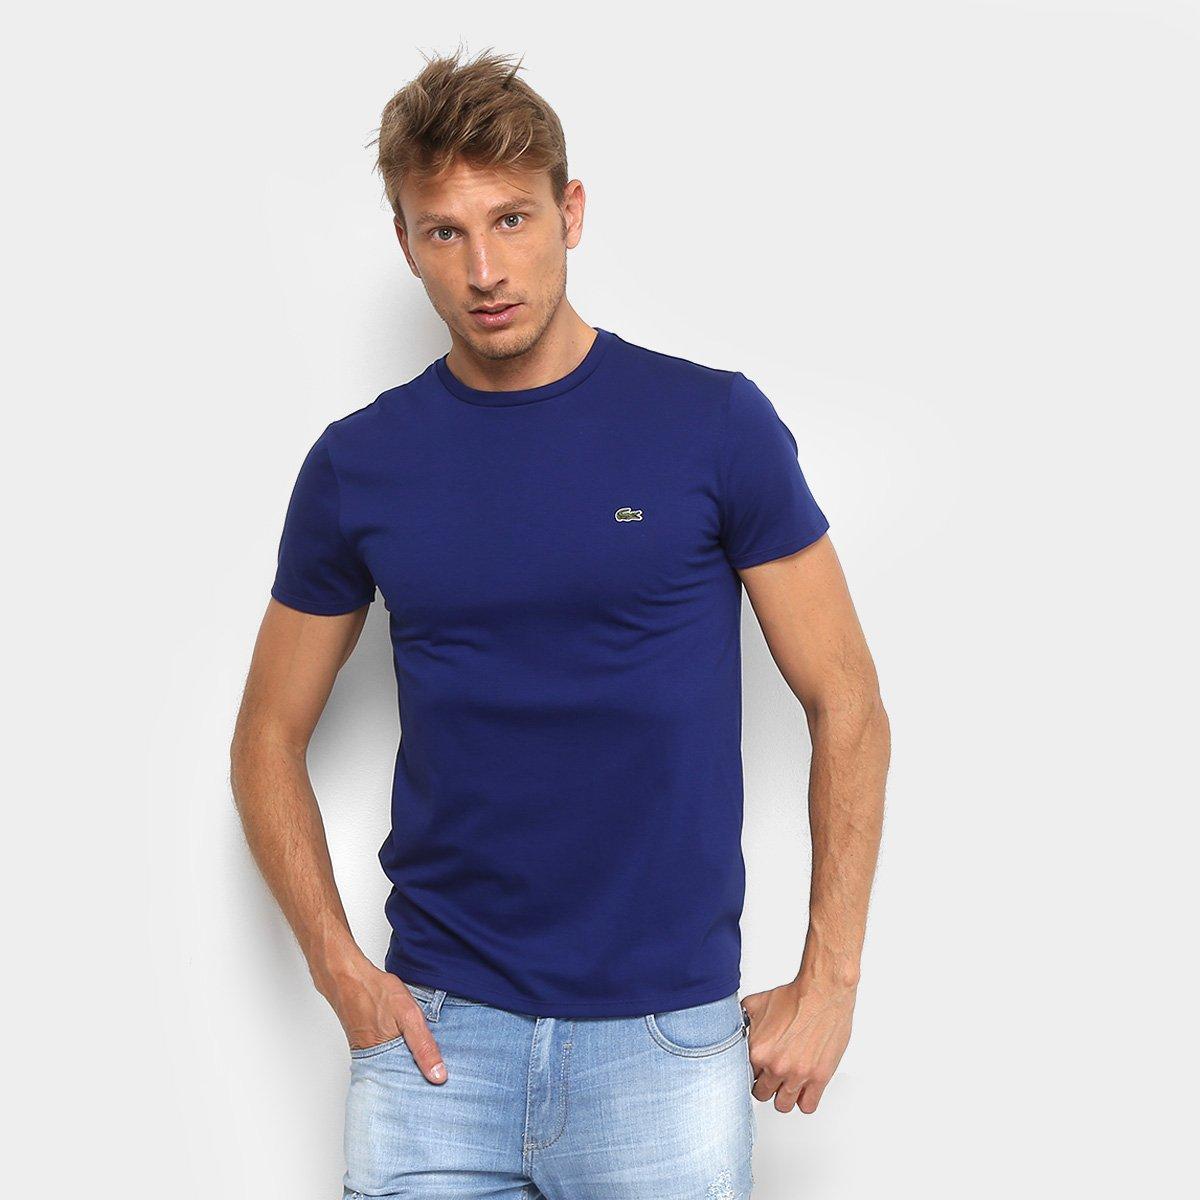 fa0fc2a0859b9 Camiseta Lacoste Básica Jersey Masculina. undefined